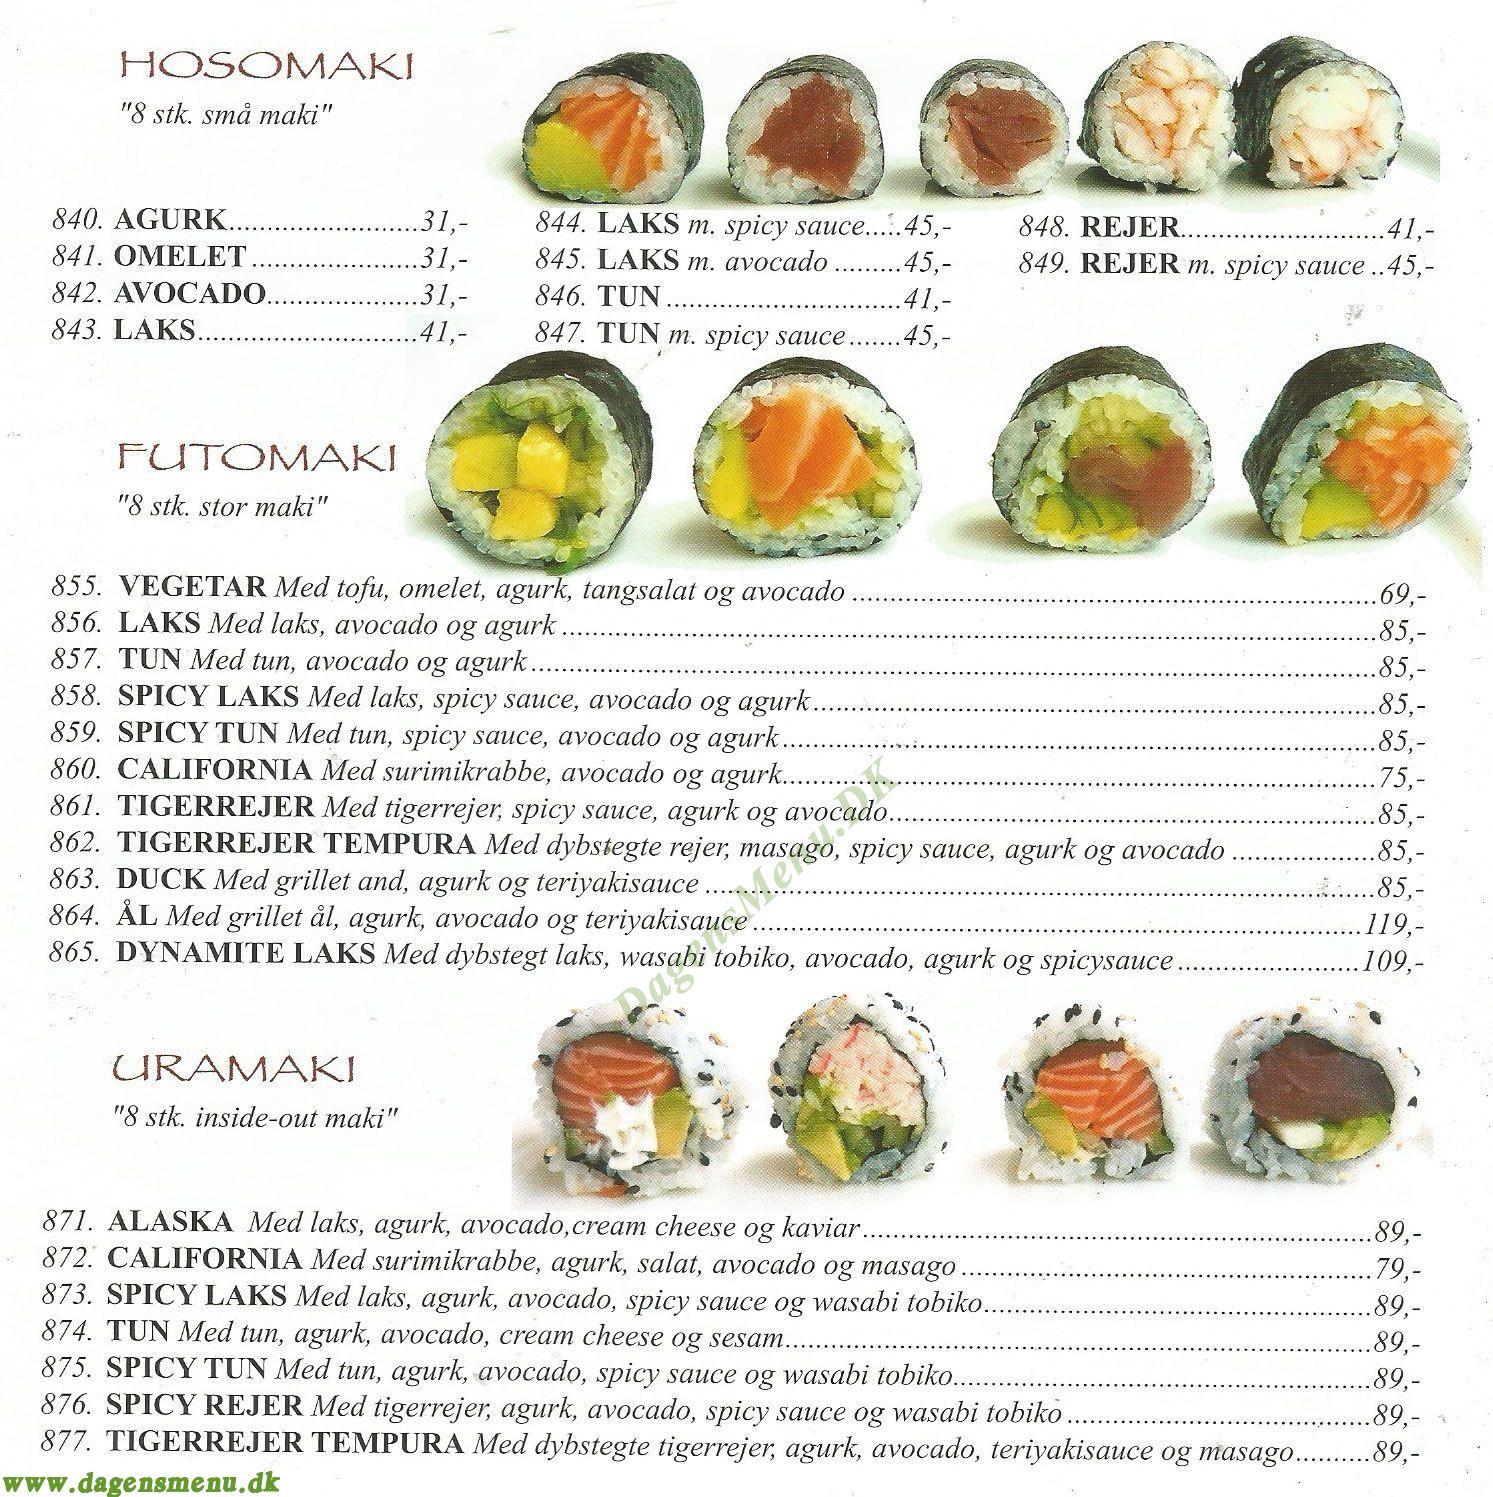 Dragon Grill Express & Sushi - Menukort